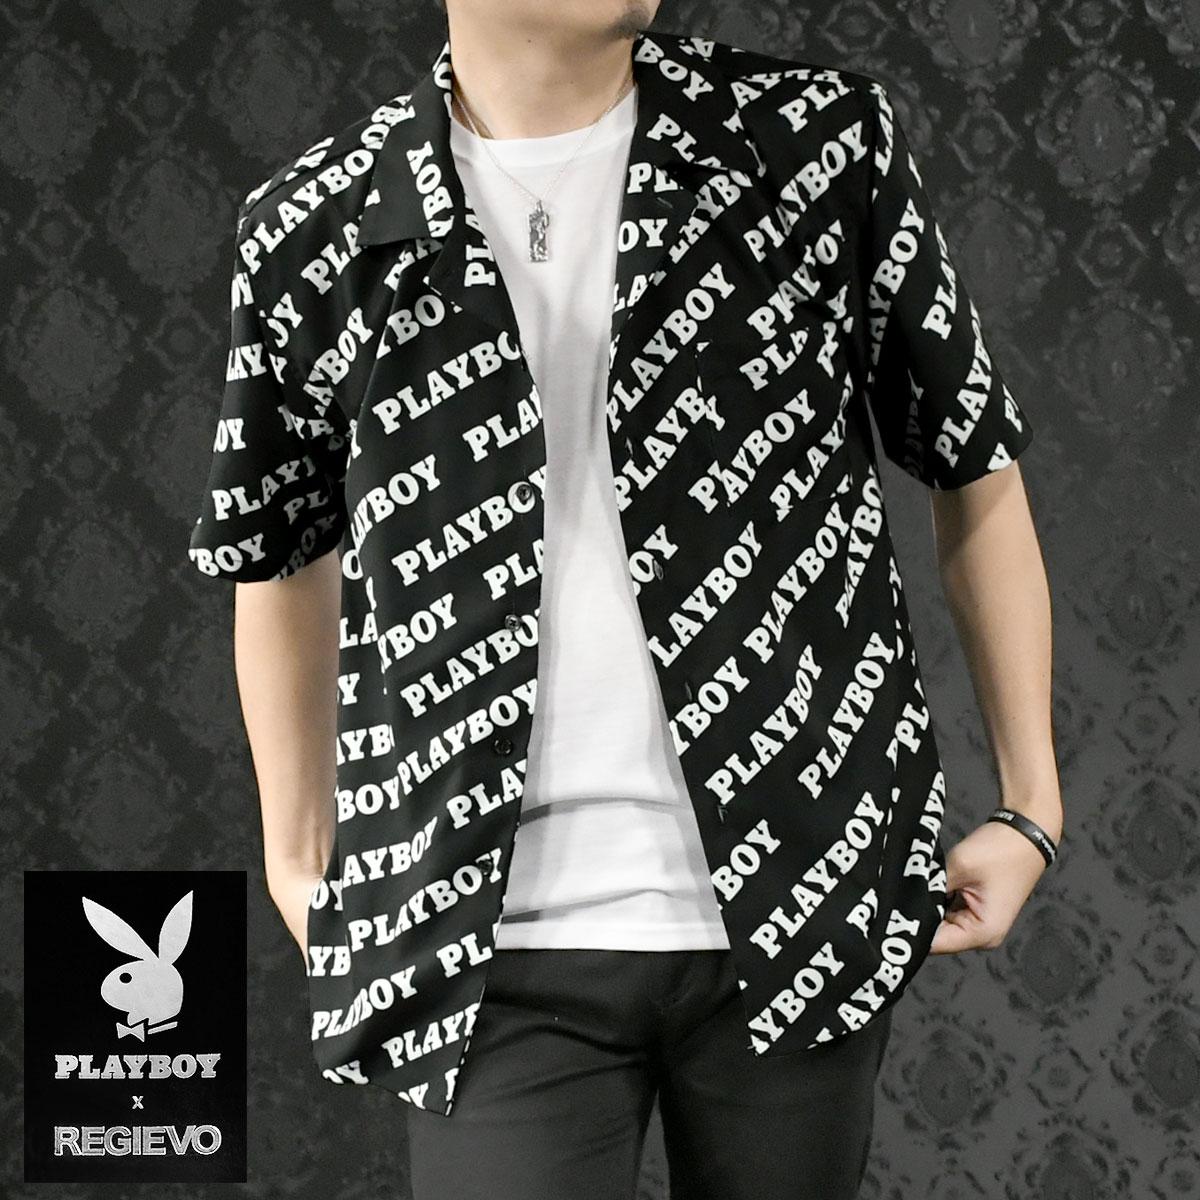 PLAYBOY プレイボーイ レジエボ 開襟シャツ メンズ 半袖 ロゴ プリント オープンシャツ mens(ブラック黒) 95147